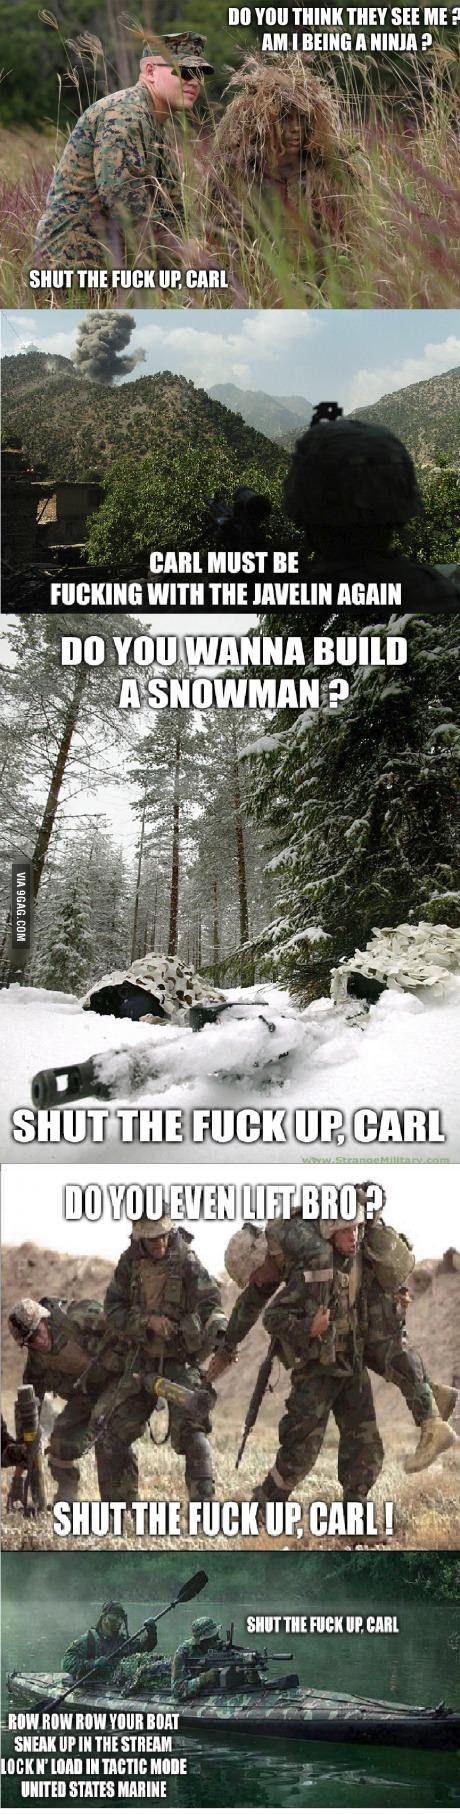 Carl's at it again